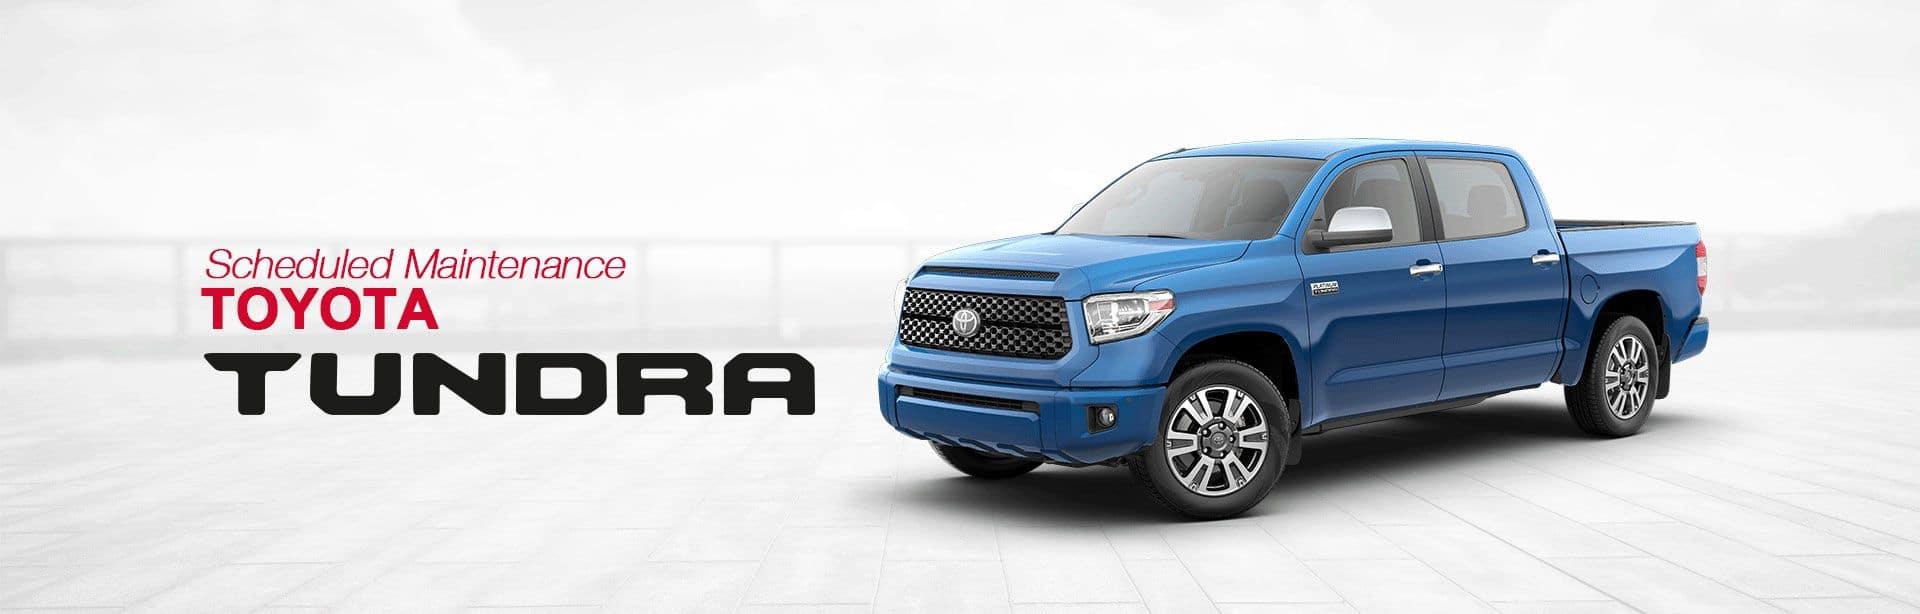 Toyota Tundra Service Schedule